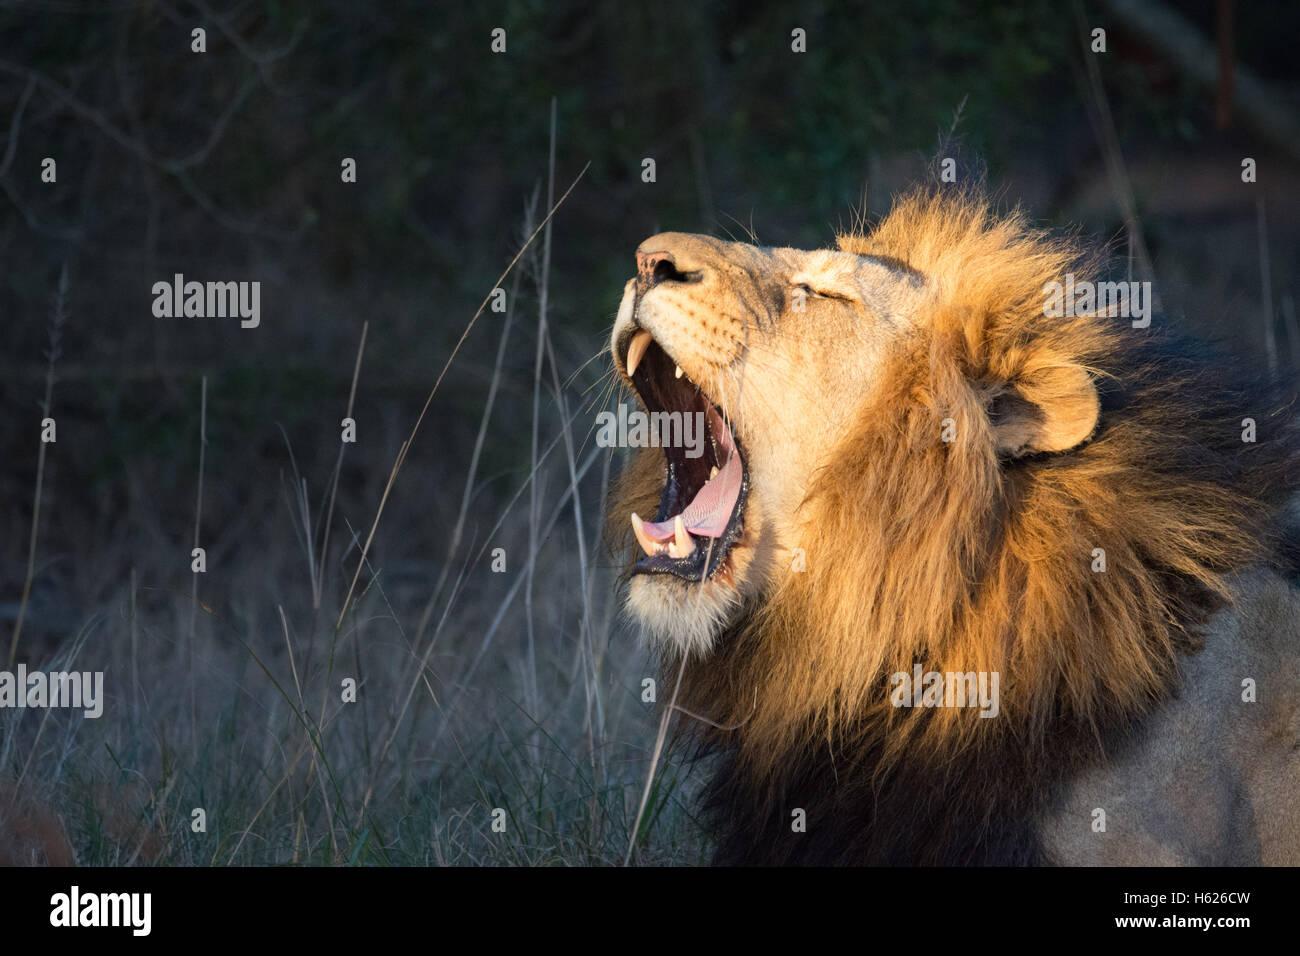 Lion Yawning, big teeth. - Stock Image